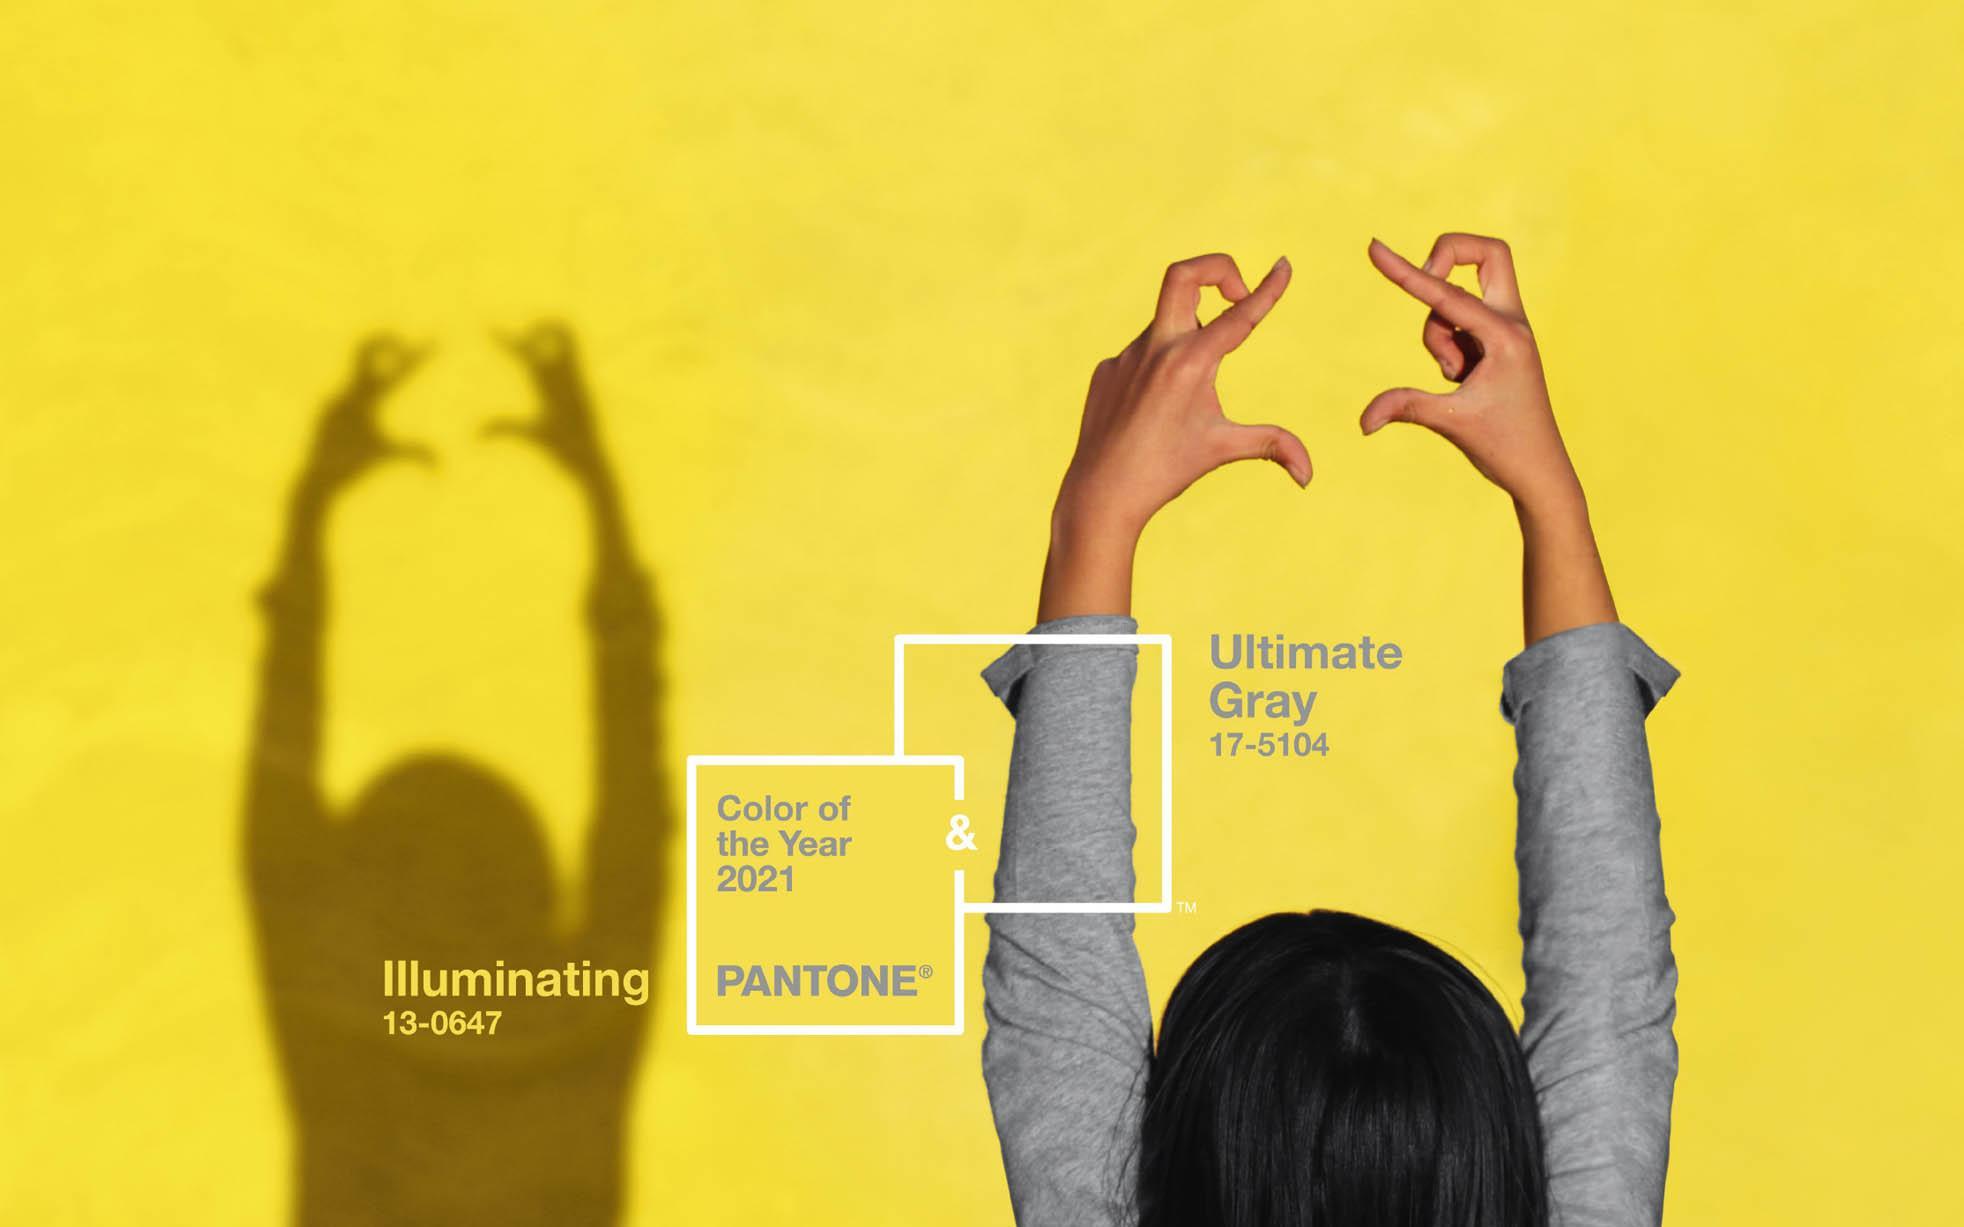 Pantone® Ultimate Gray + Illuminating - Cor do ano de 2021 - AcrediteCo.